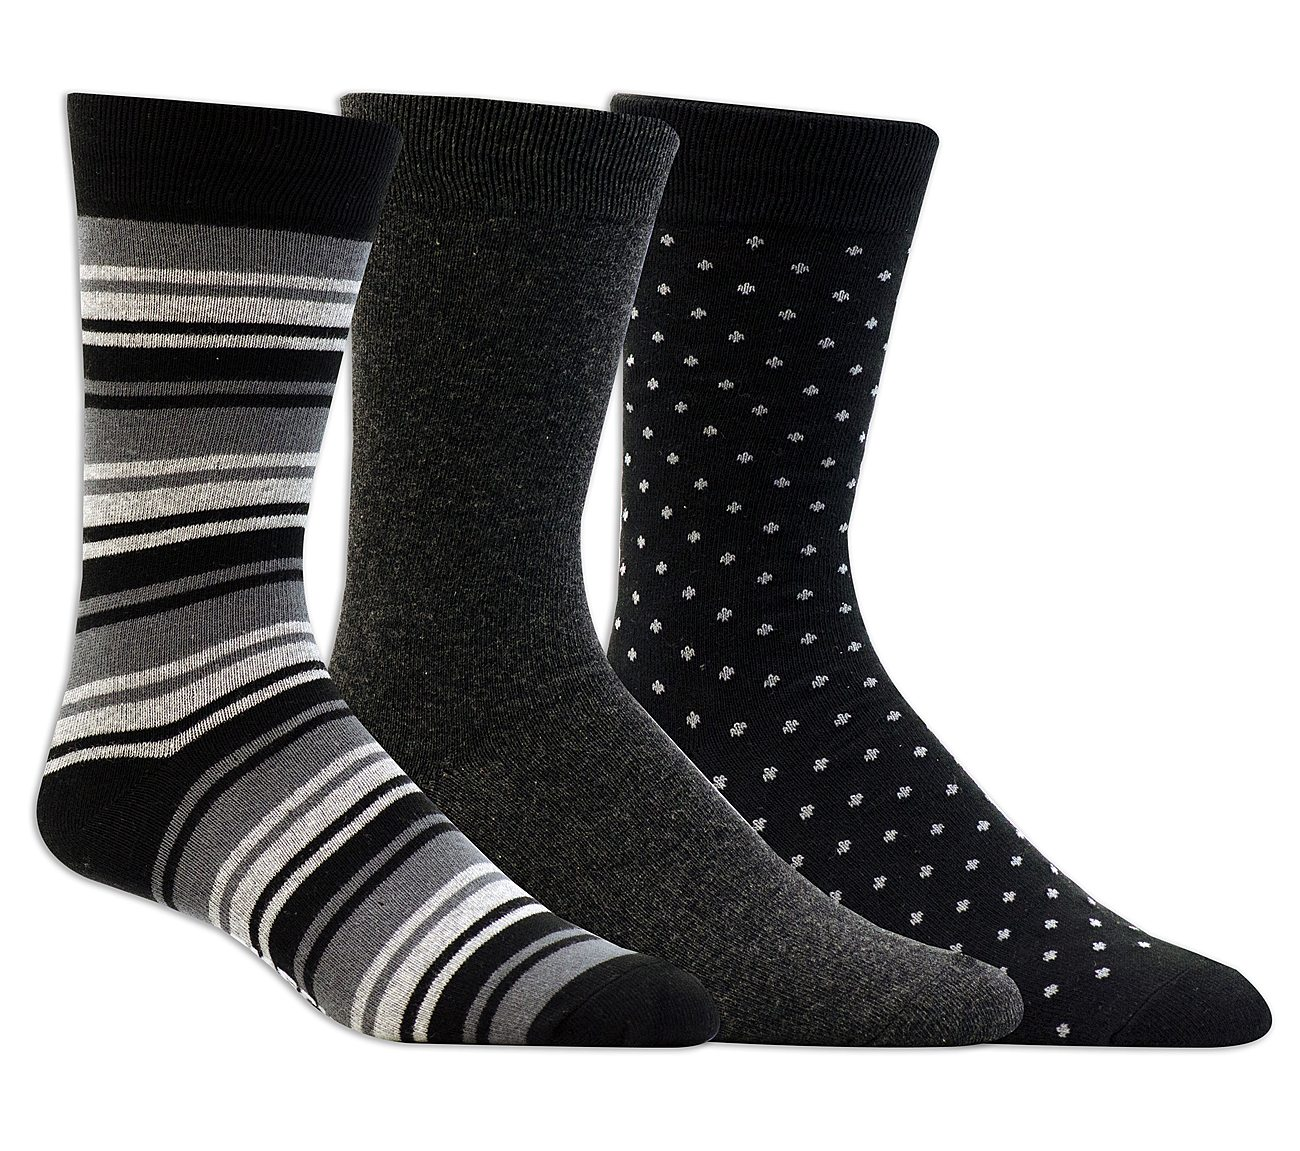 3 Pack Casual Dress Crew Socks